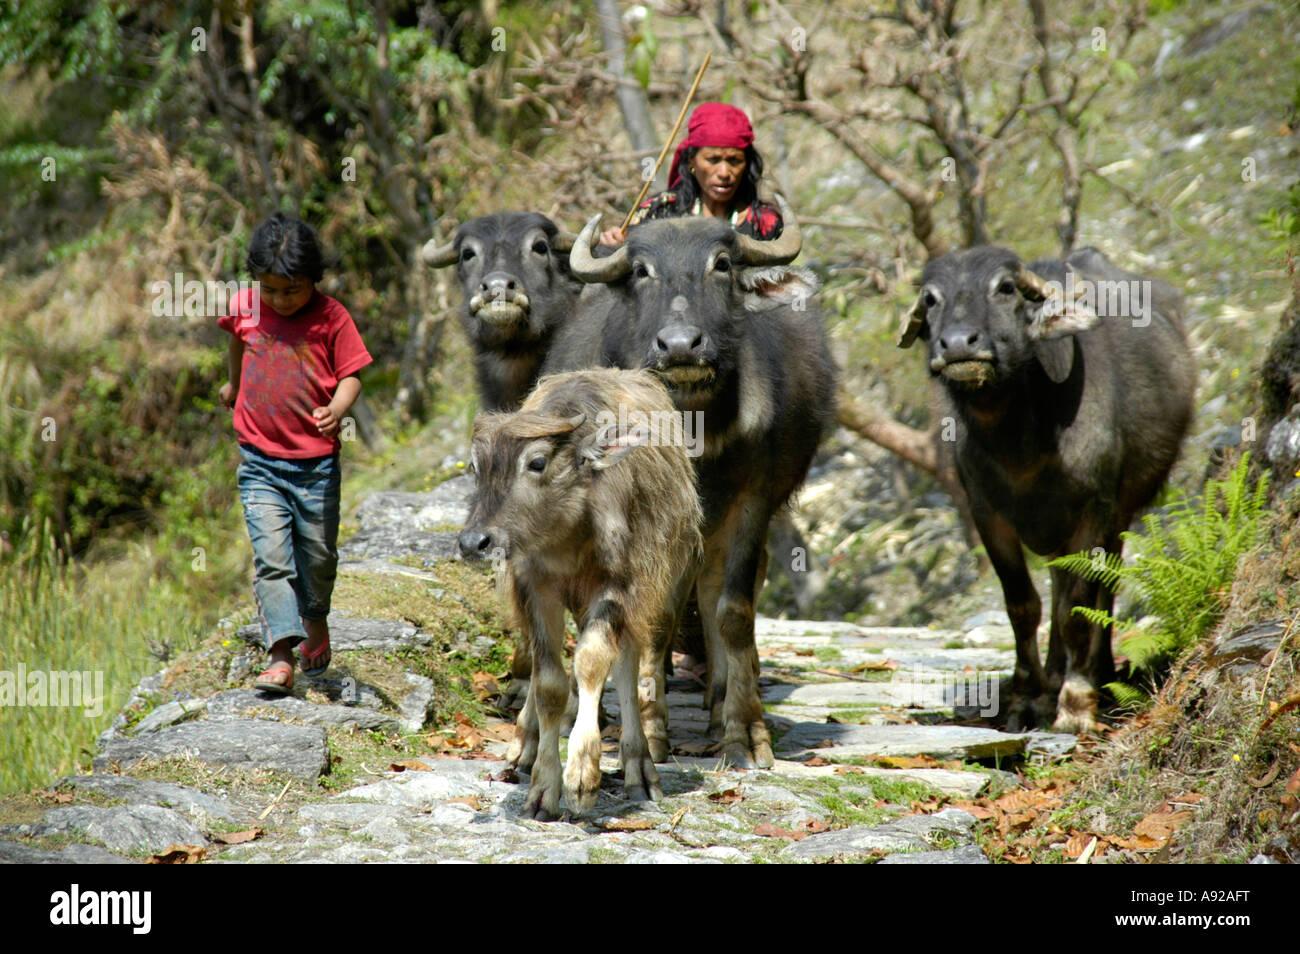 Three ox and a calw are driven on a path Landruk near Pokhara Nepal - Stock Image